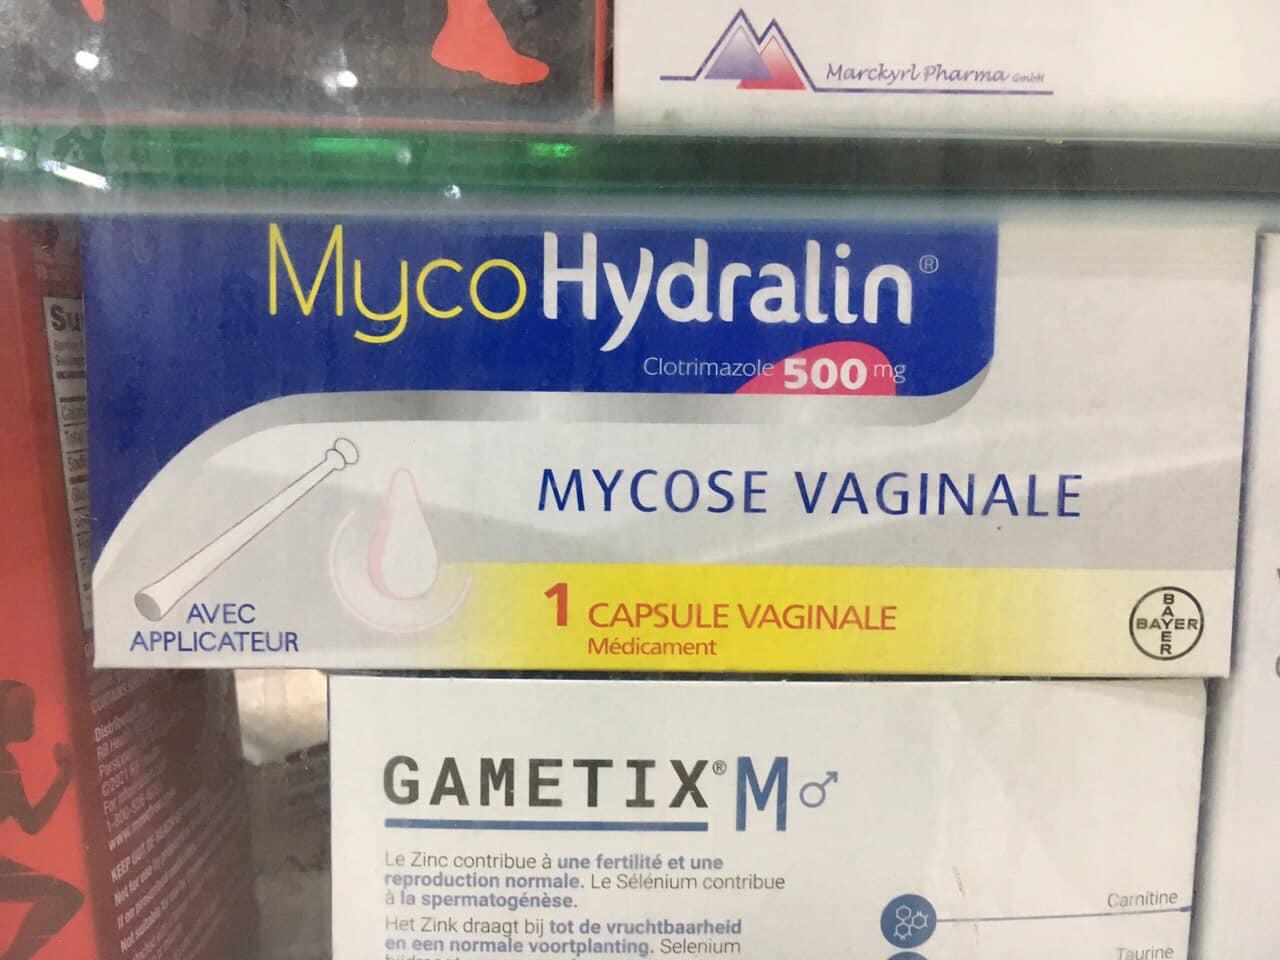 Myco Hydralin 500mg